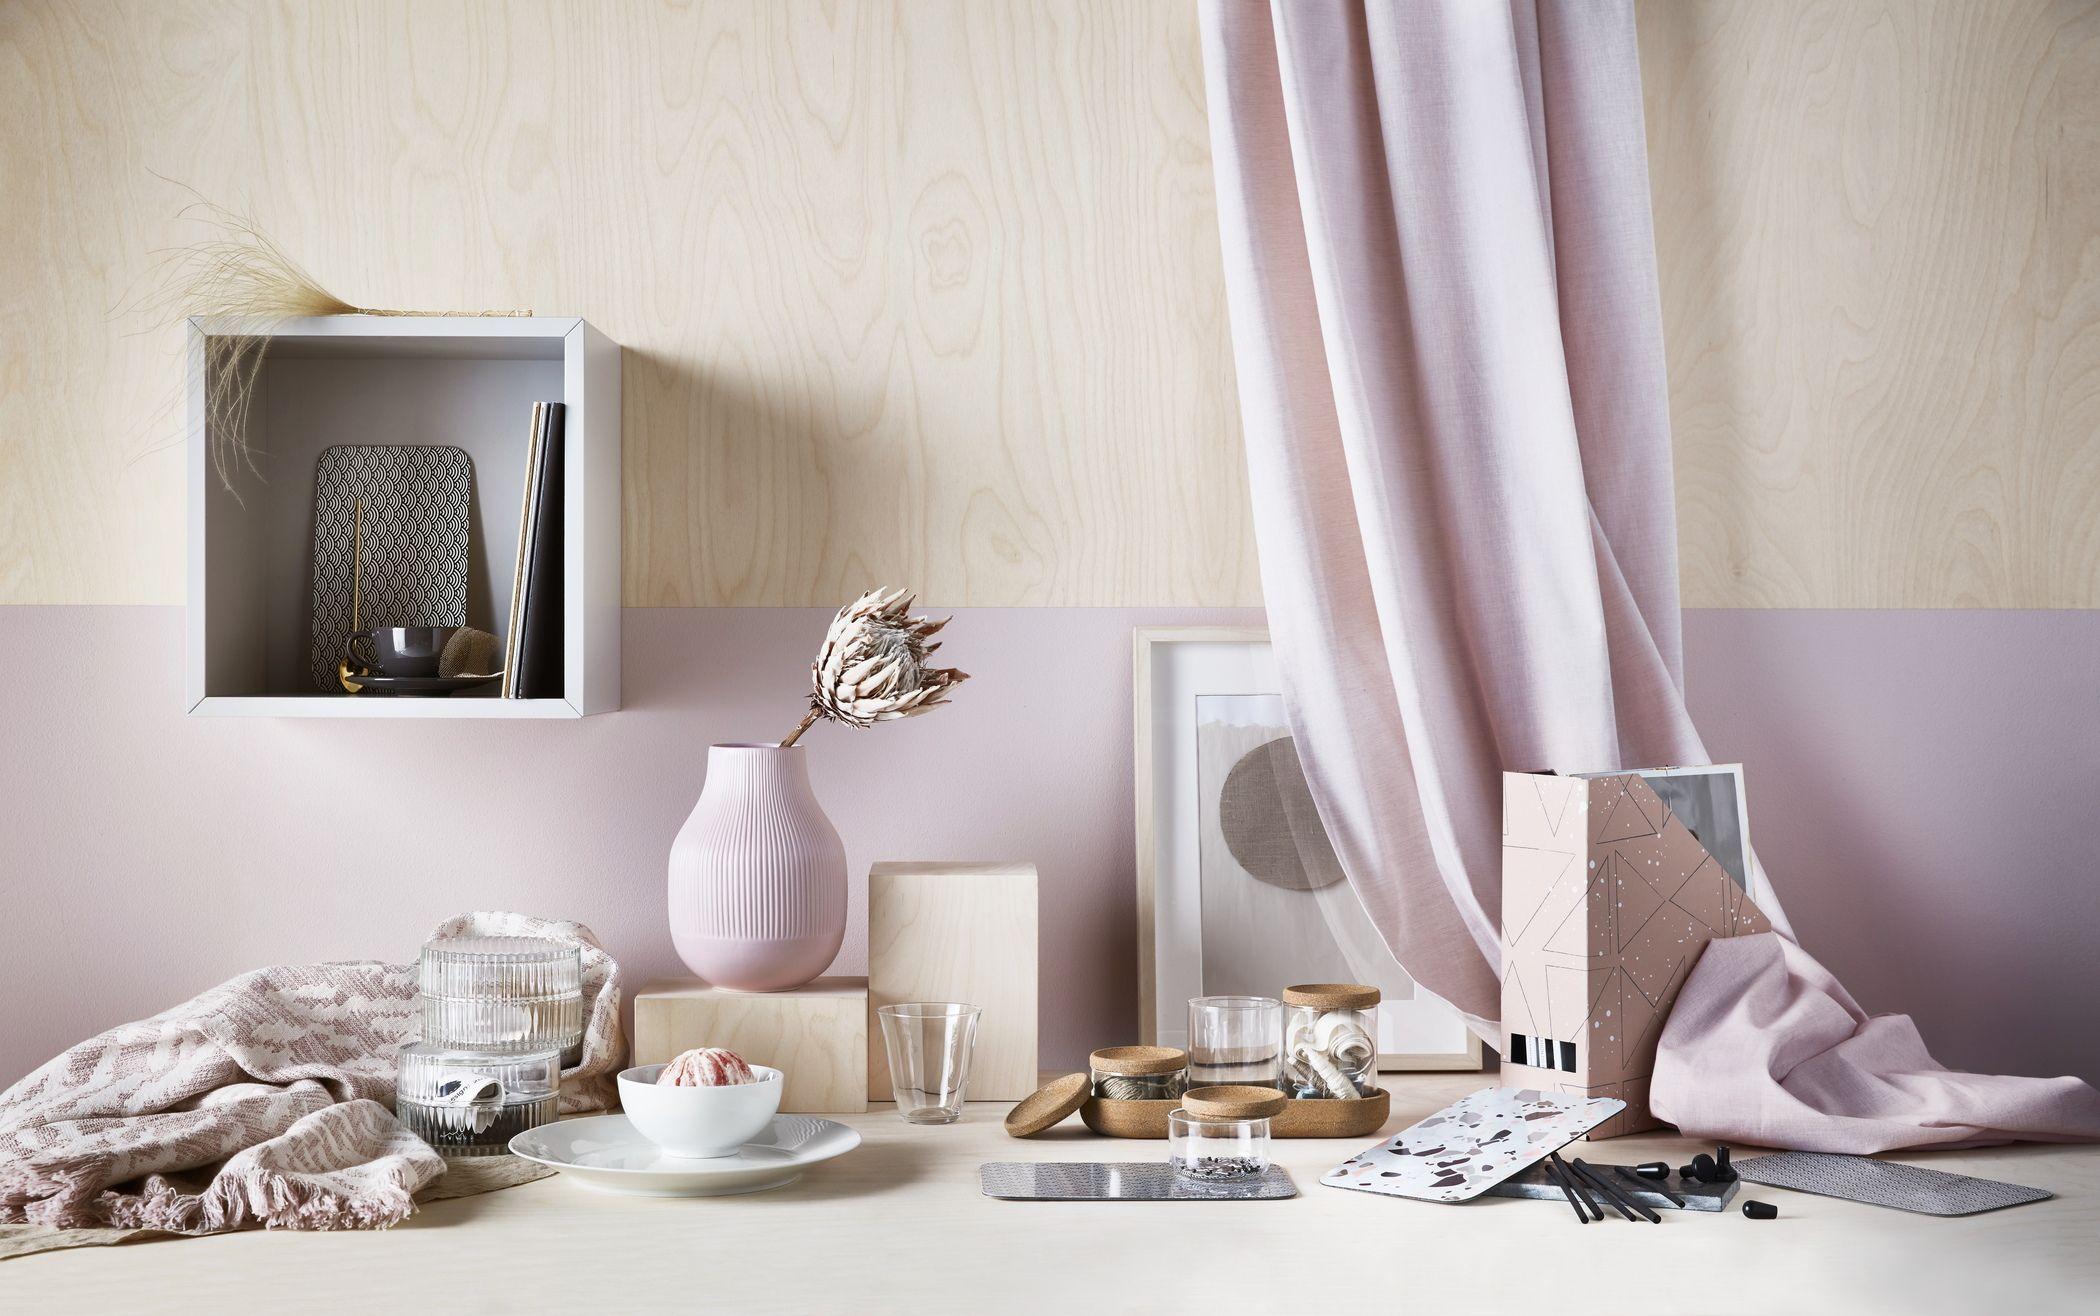 ikea katalog 2019 54. Black Bedroom Furniture Sets. Home Design Ideas